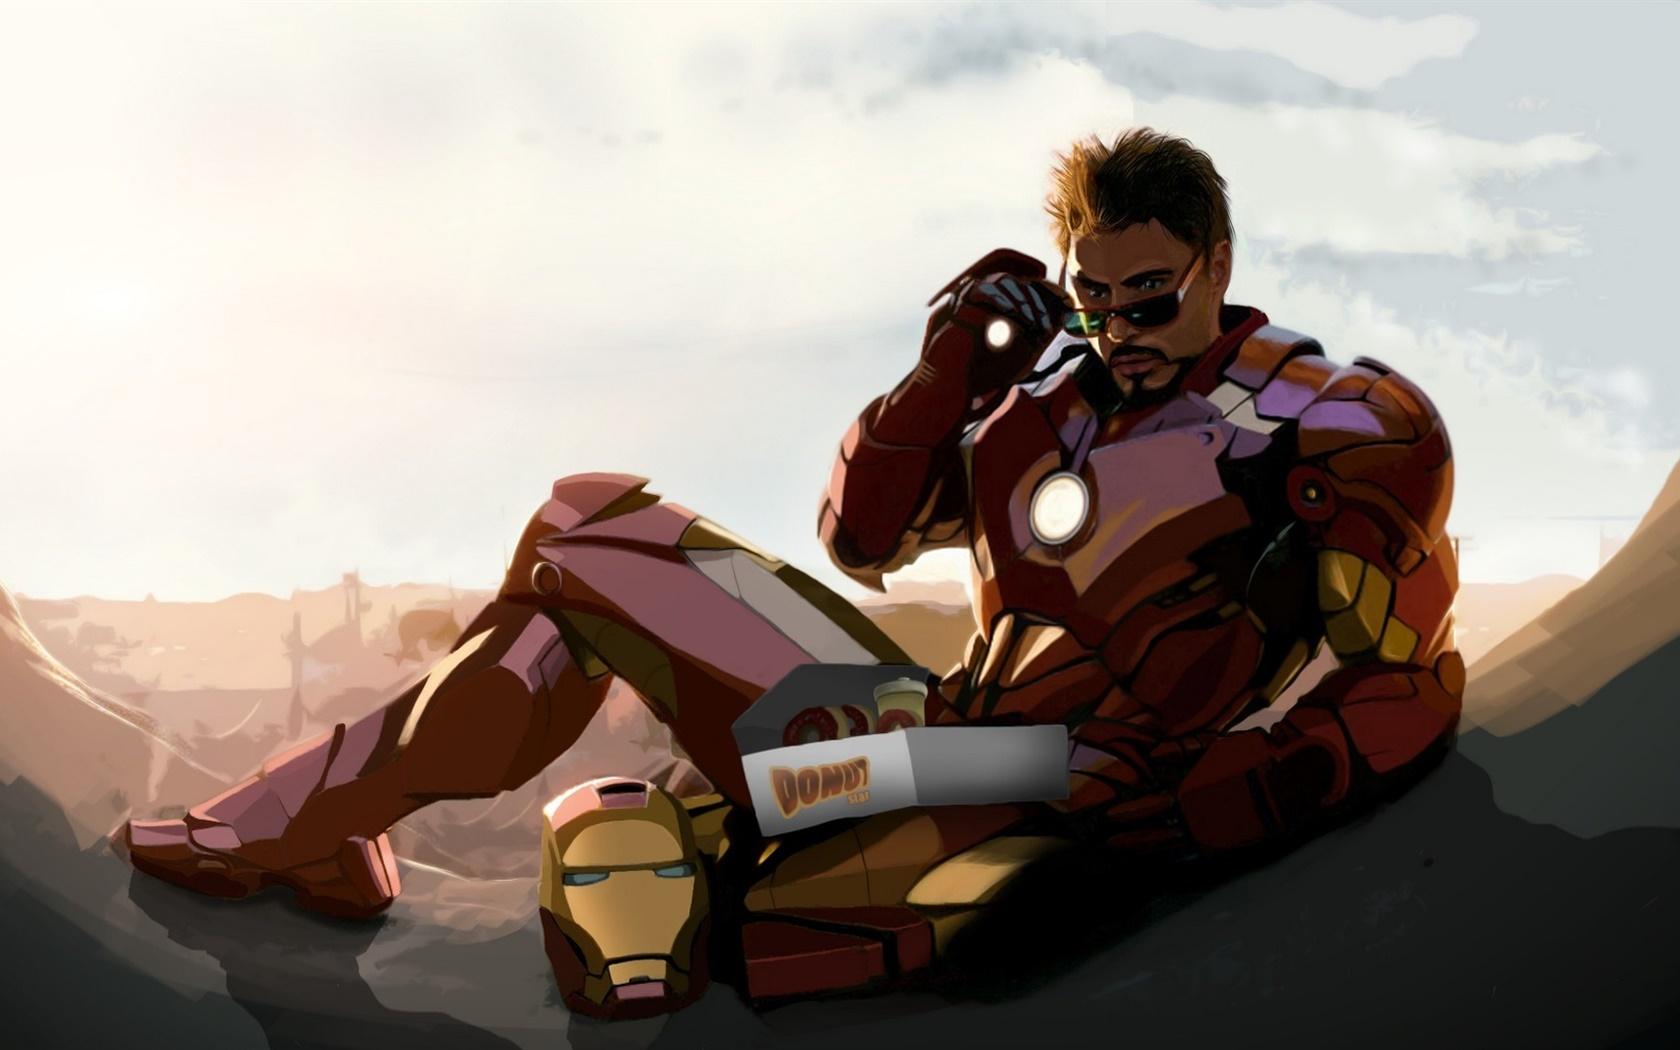 Iron Man, Tony Stark, Robert Downey Jr, le dessin d'art Fonds d'écran ... Robert Downey